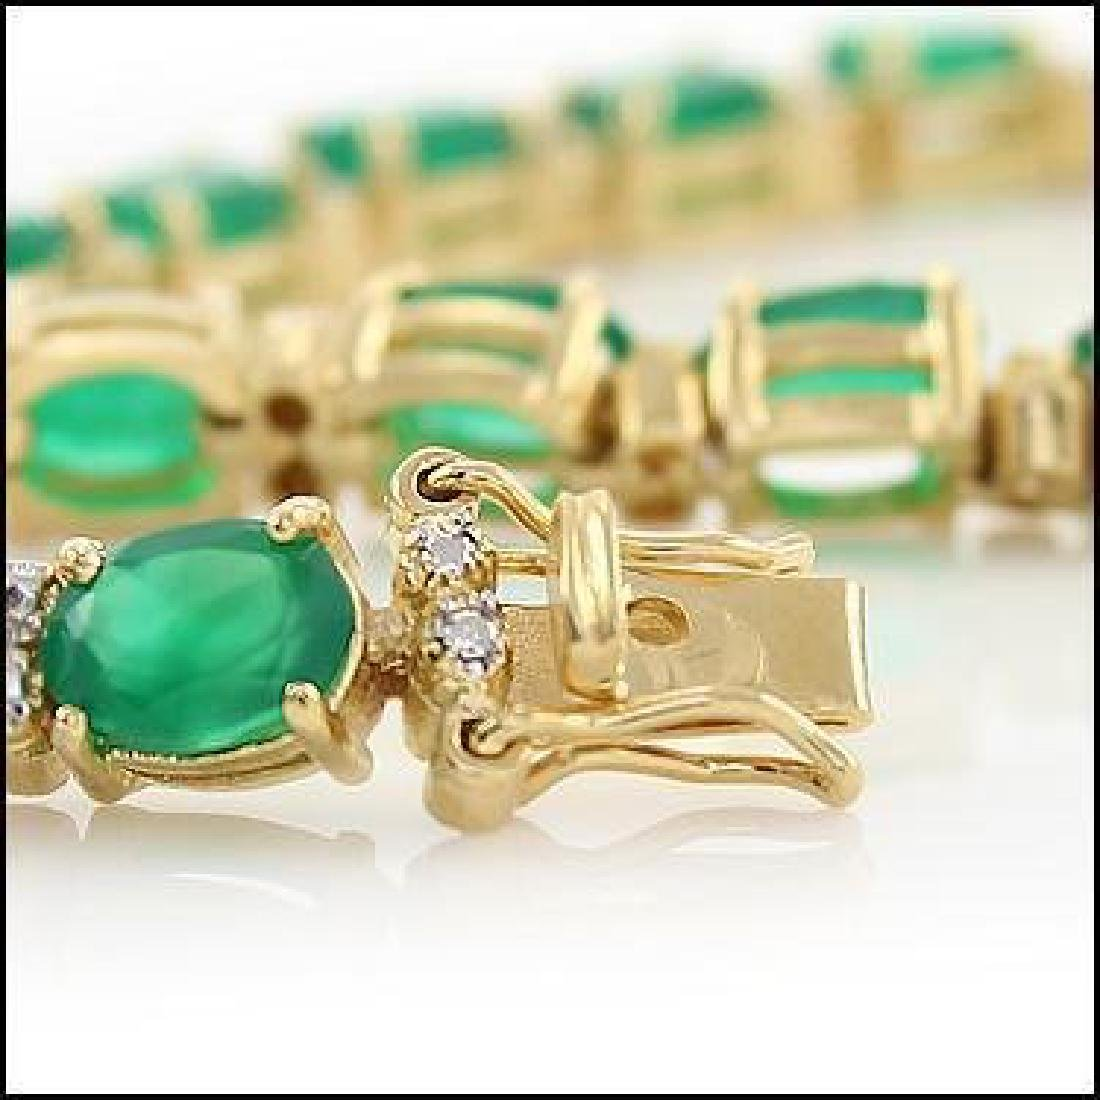 13 CT Green Agate Diamond Tennis Bracelet - 4